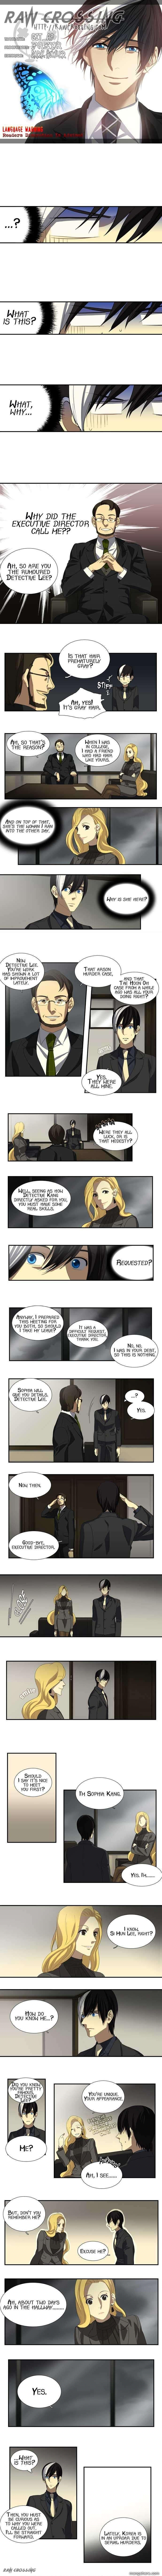 Supernatural Investigation Department 25 Page 1